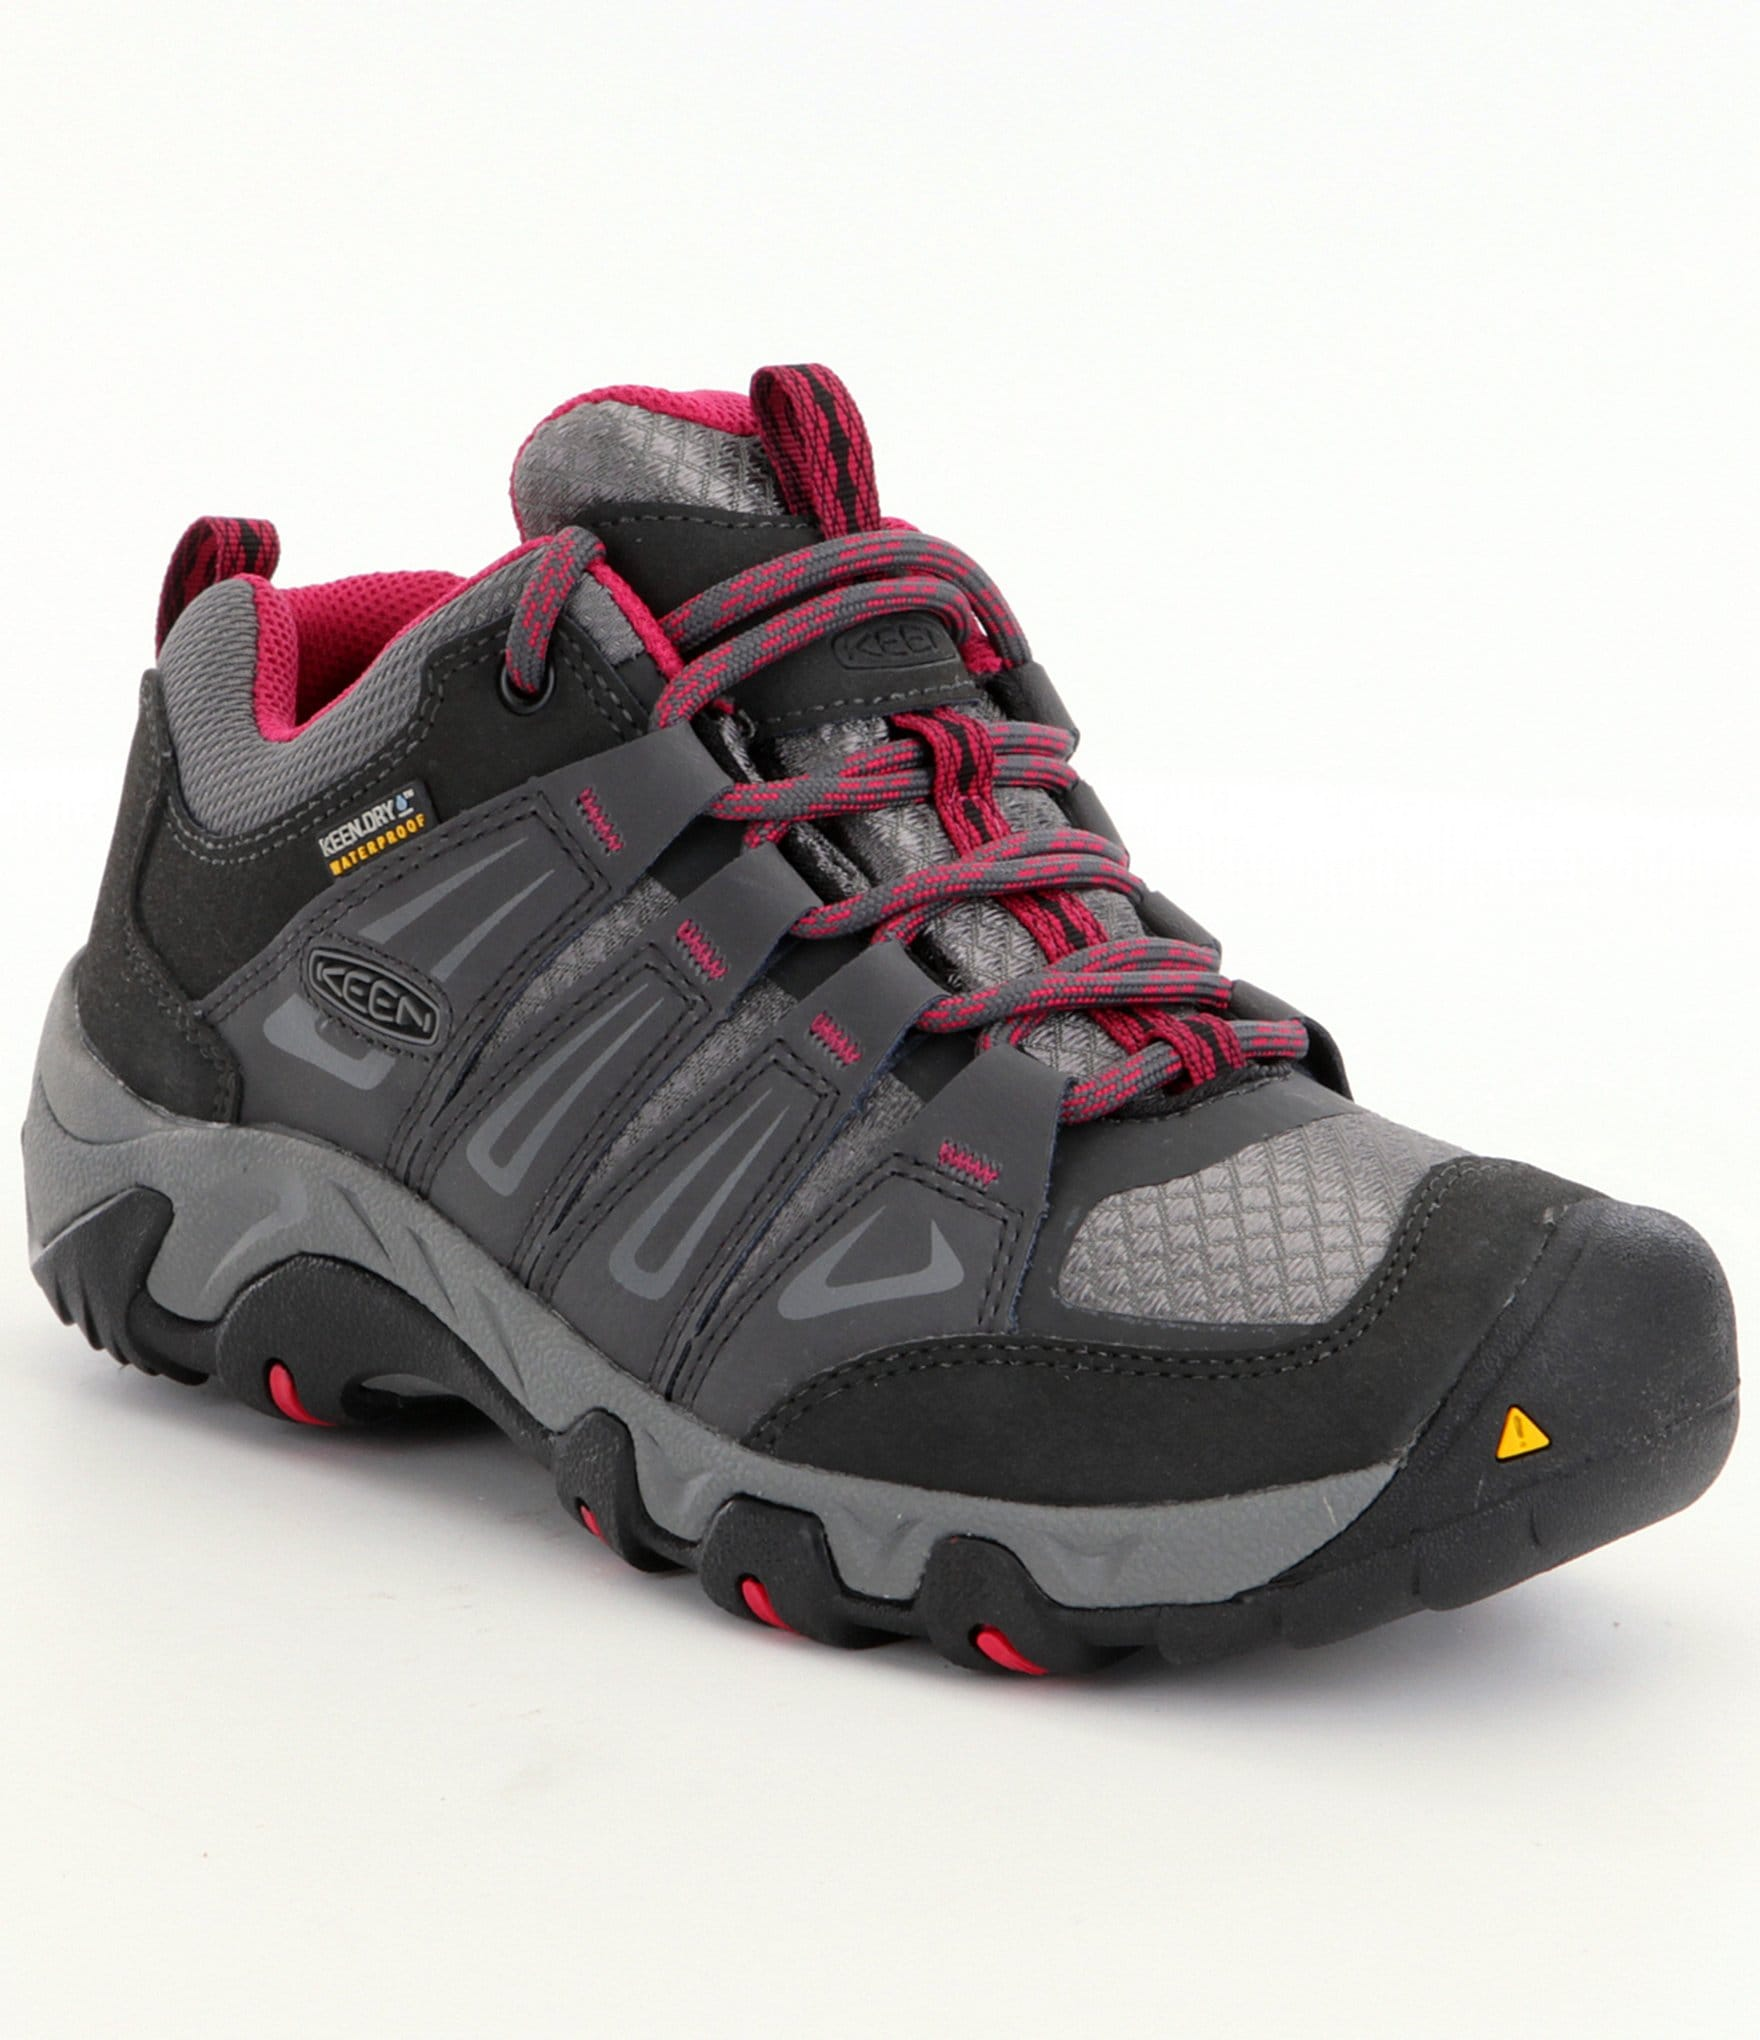 keen women s shoes dillards